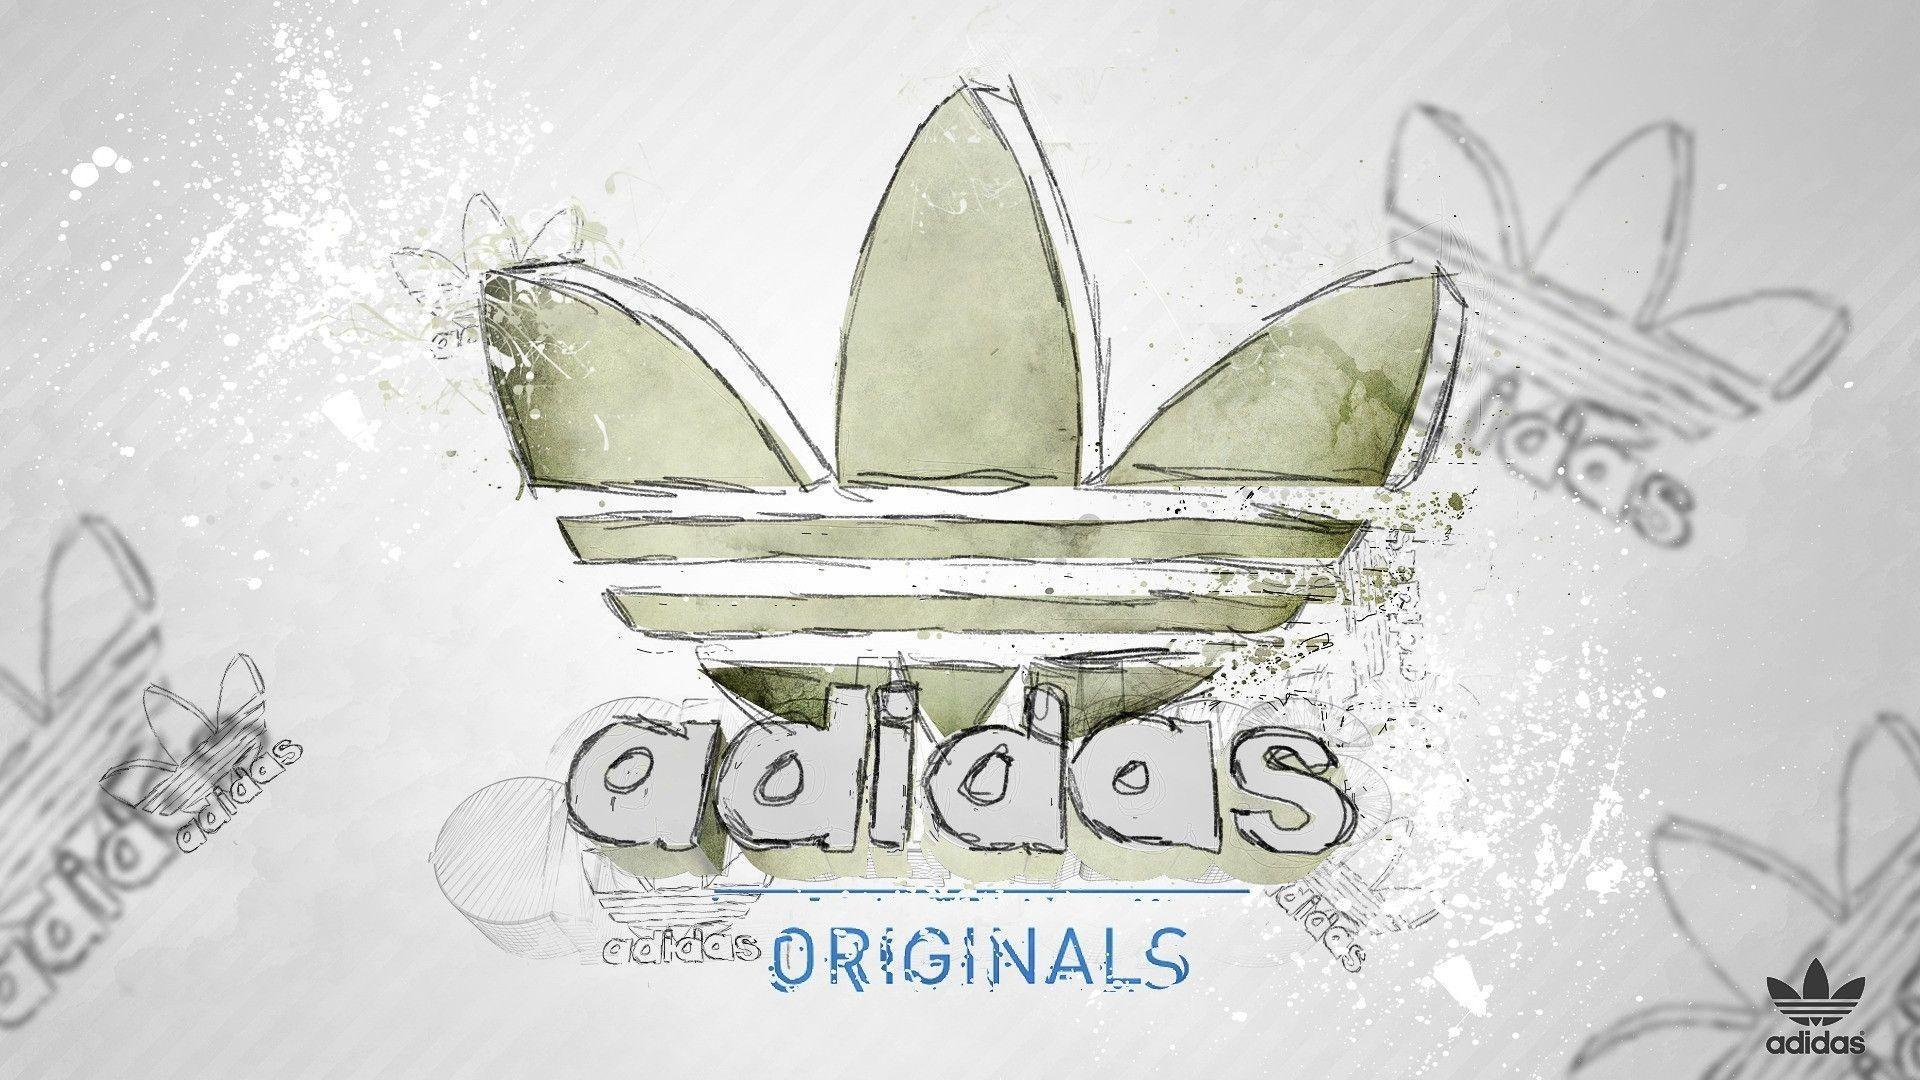 98 Sketch Wallpapers Wallpaper Cave Sketches Wallpapers: Adidas Originals Logo Wallpapers